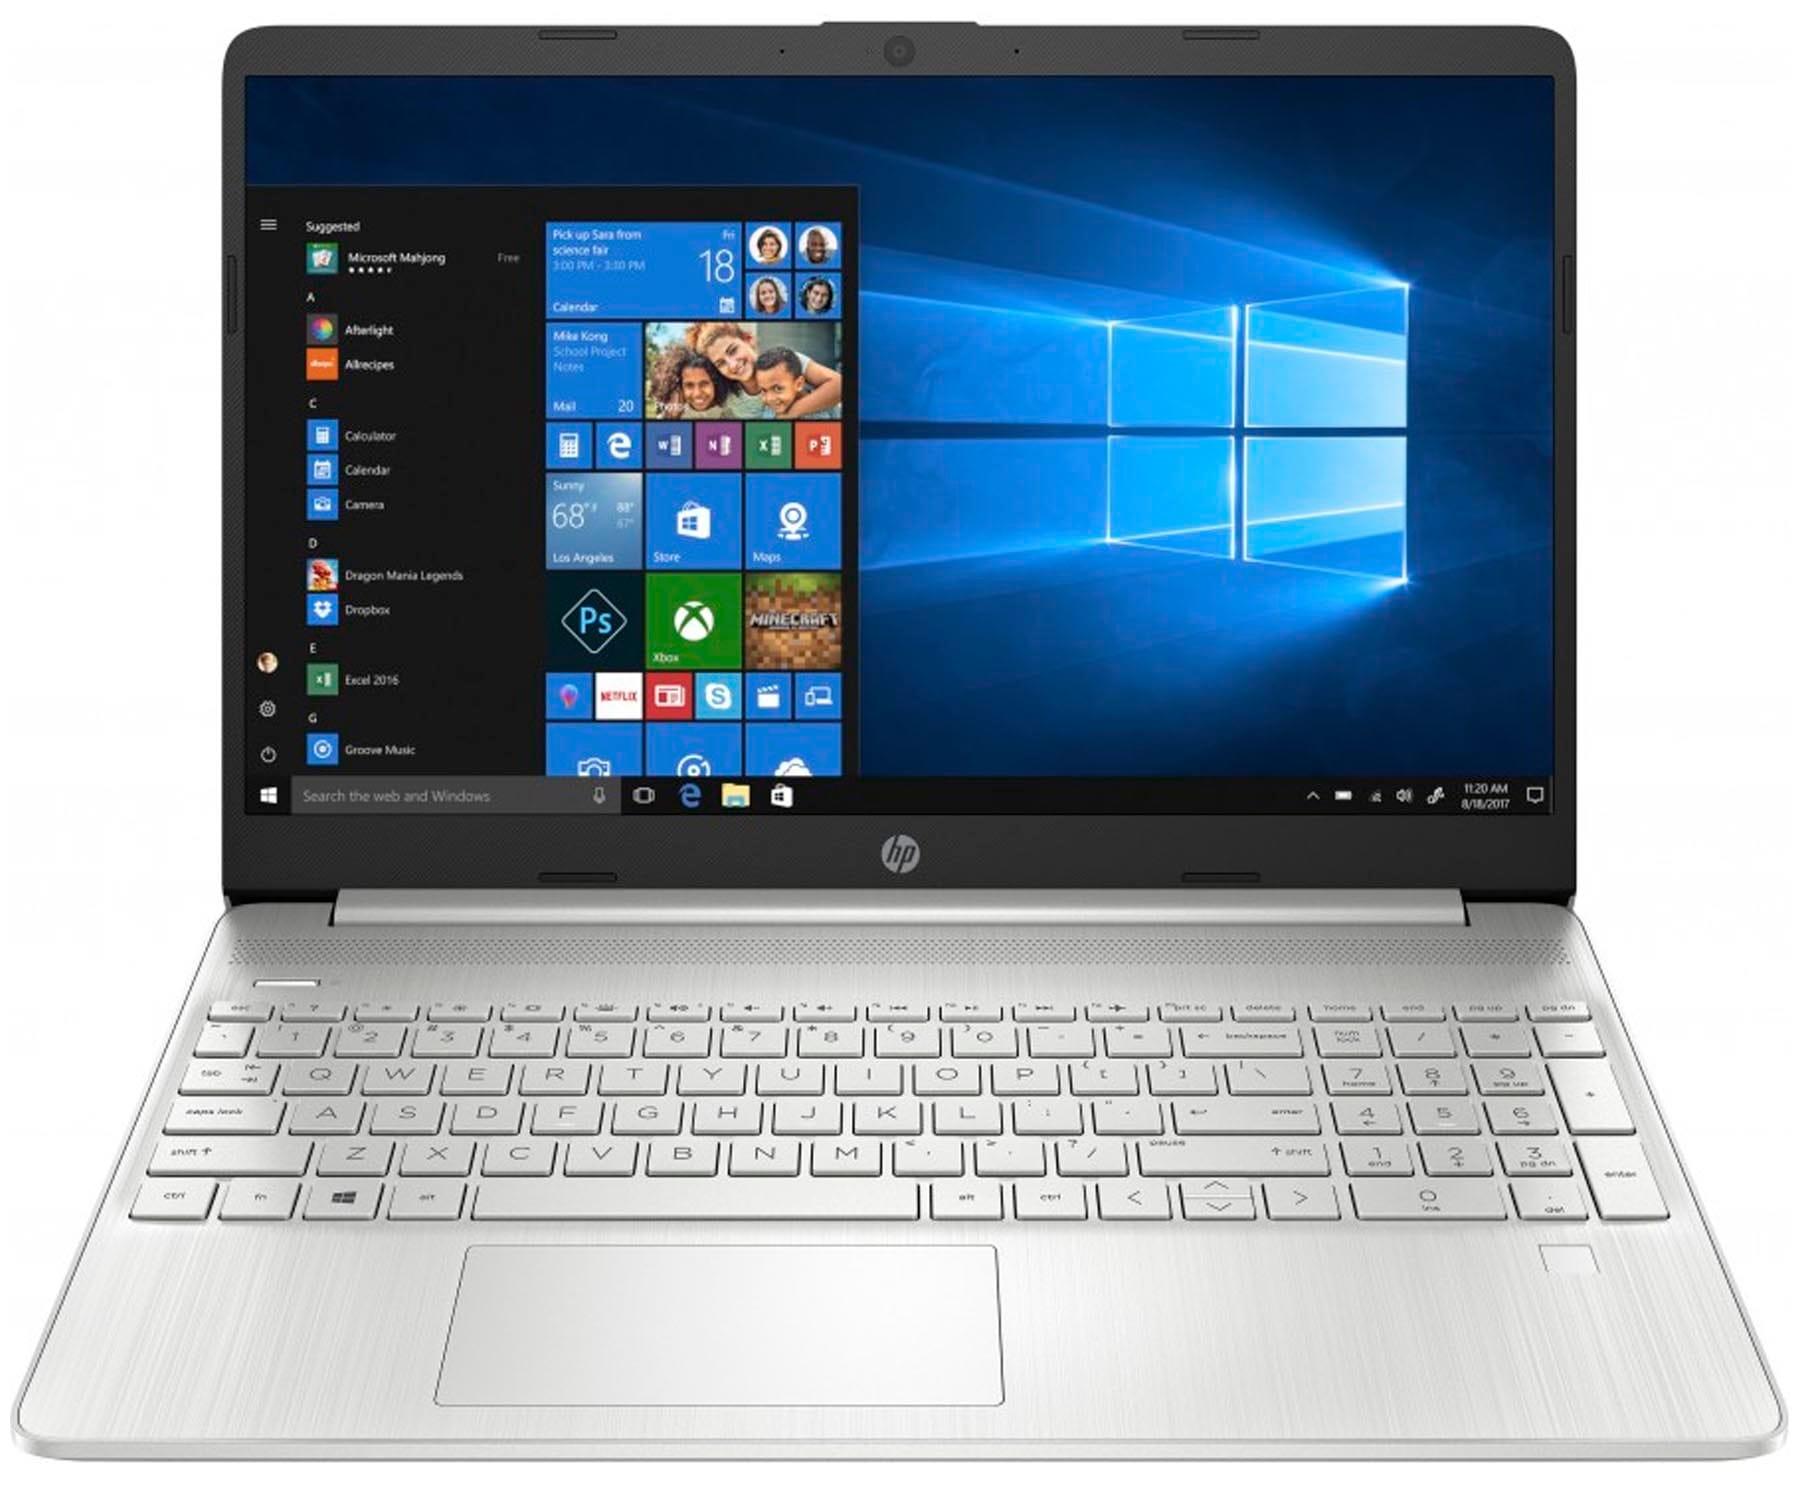 HP LAPTOP 15s-EQ1002 PLATA PORTÁTIL 15.6'' HD AMD RYZEN 7-3700U 256GB SSD 8GB RAM WINDOWS 10 HOME